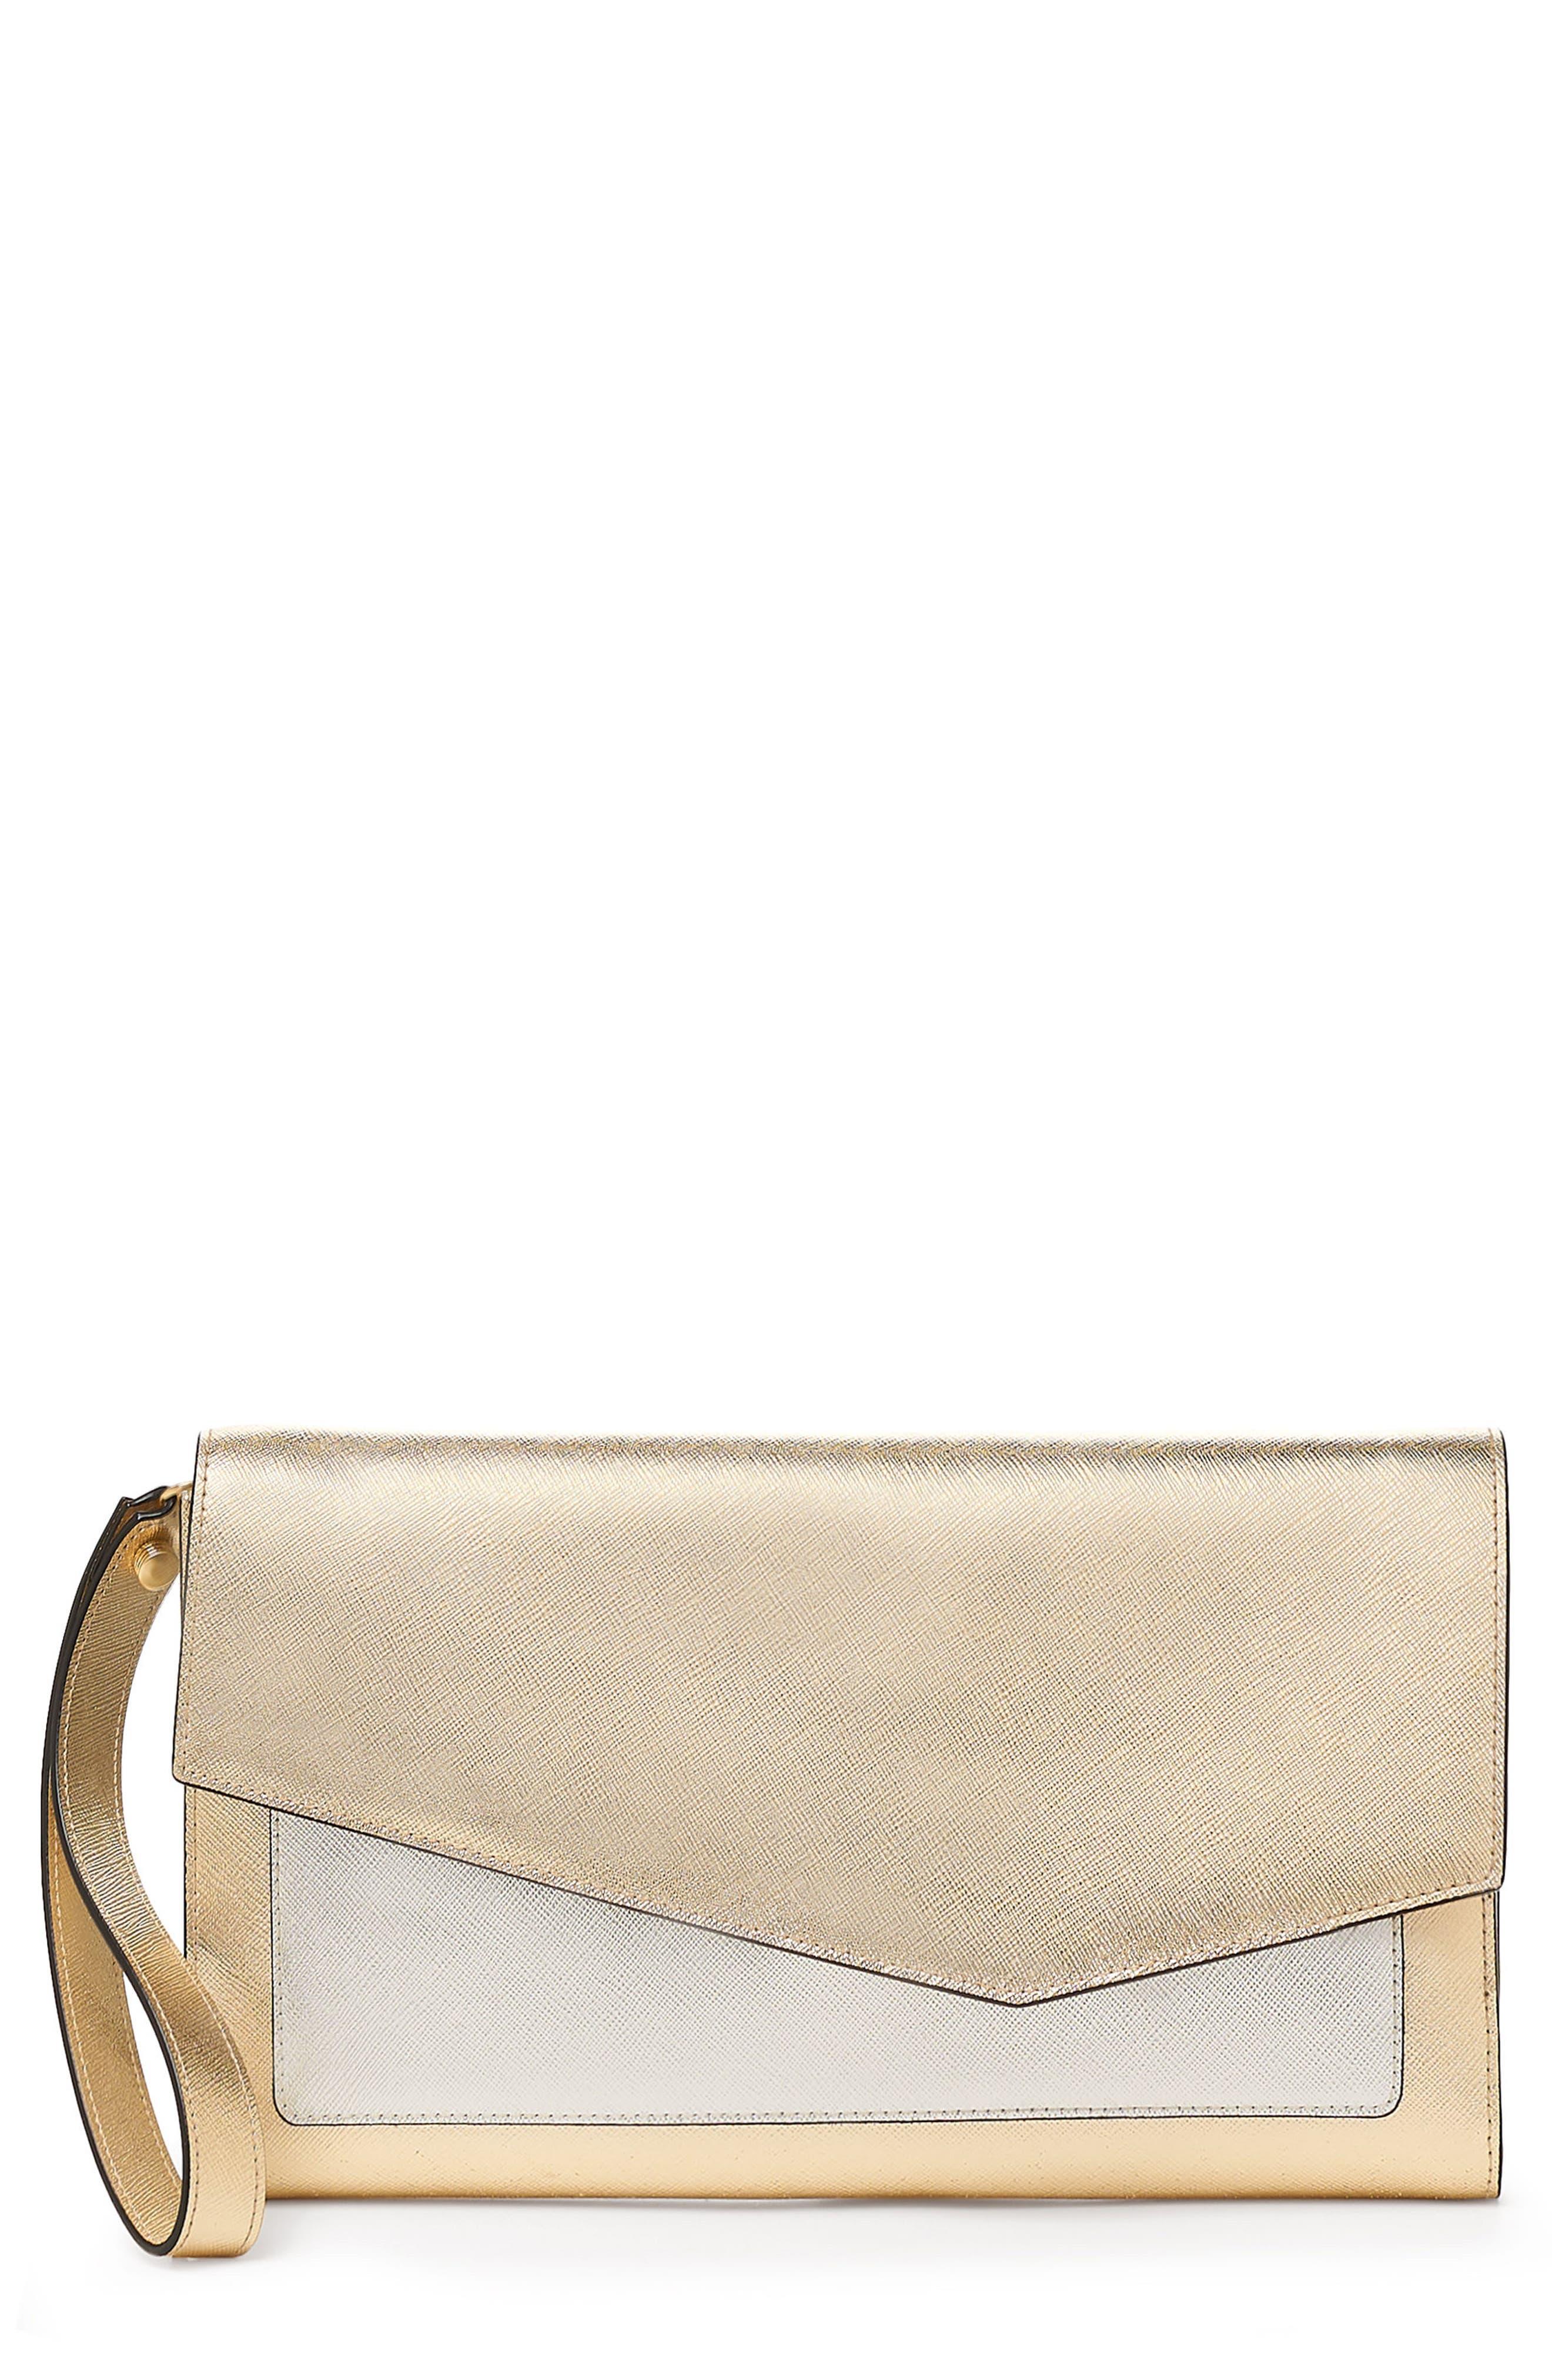 Cobble Hill Leather Wallet,                             Main thumbnail 1, color,                             GOLD COLORBLOCK